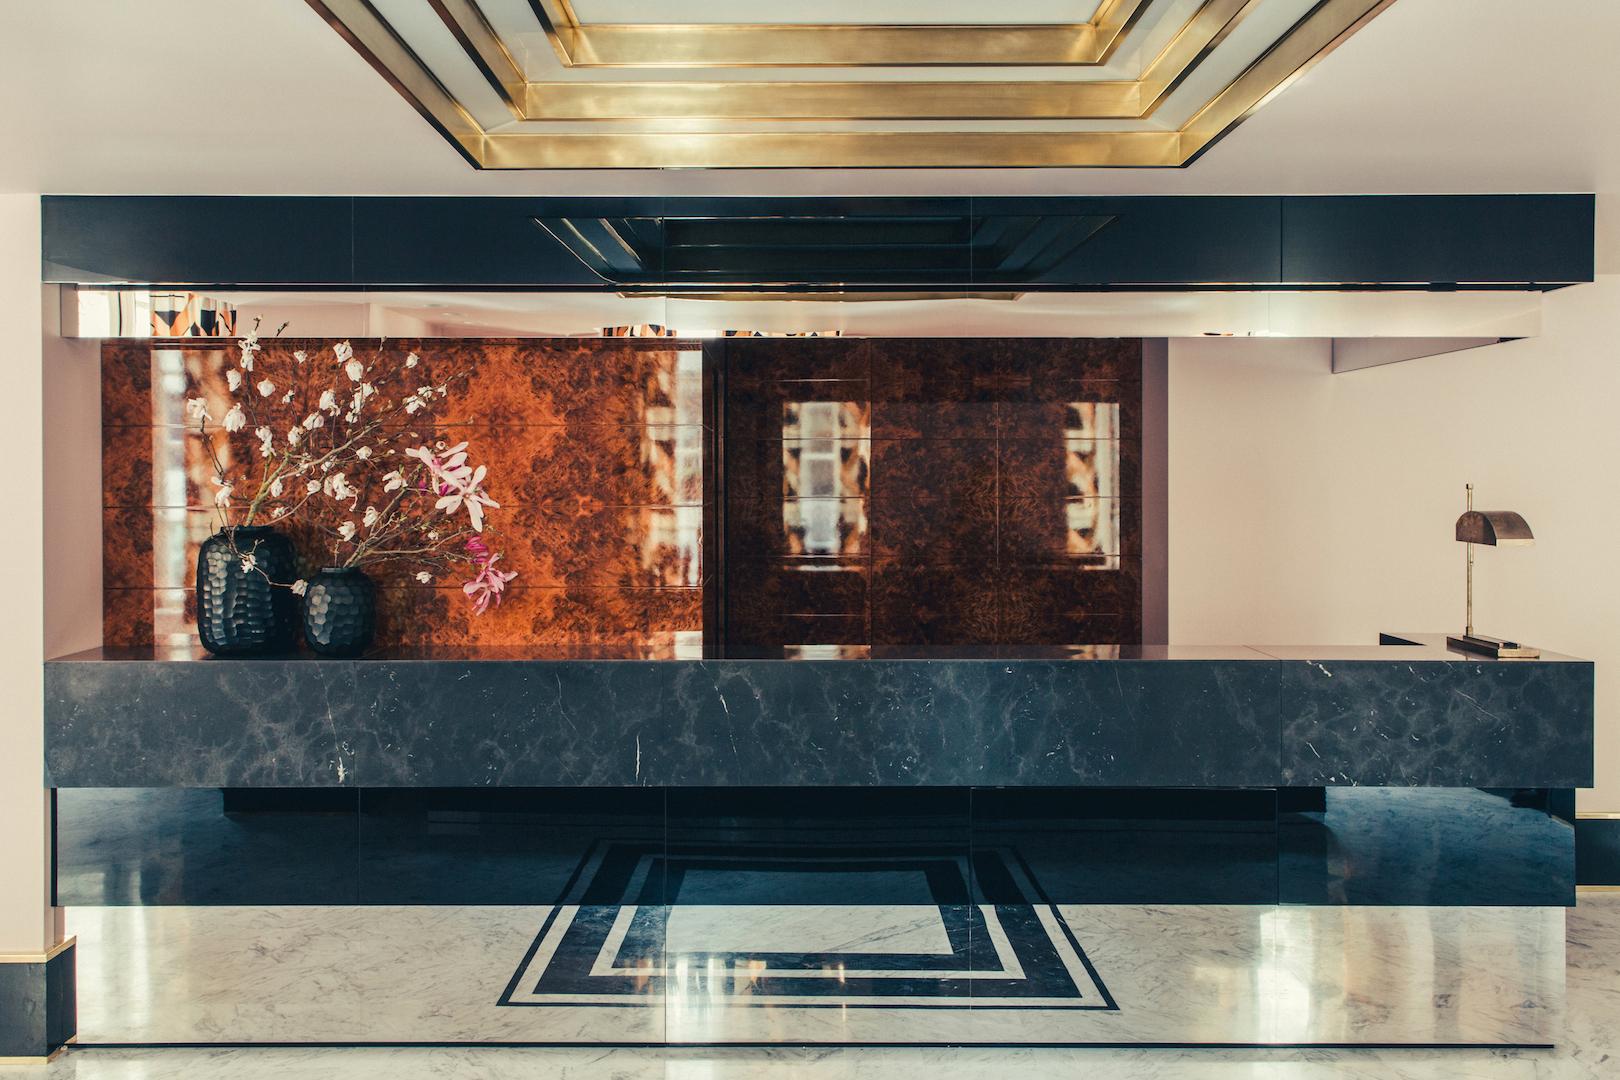 Boutique Hotel art deco Discover the Art Deco design of the Hotel Saint-Marc Boutique Hotel